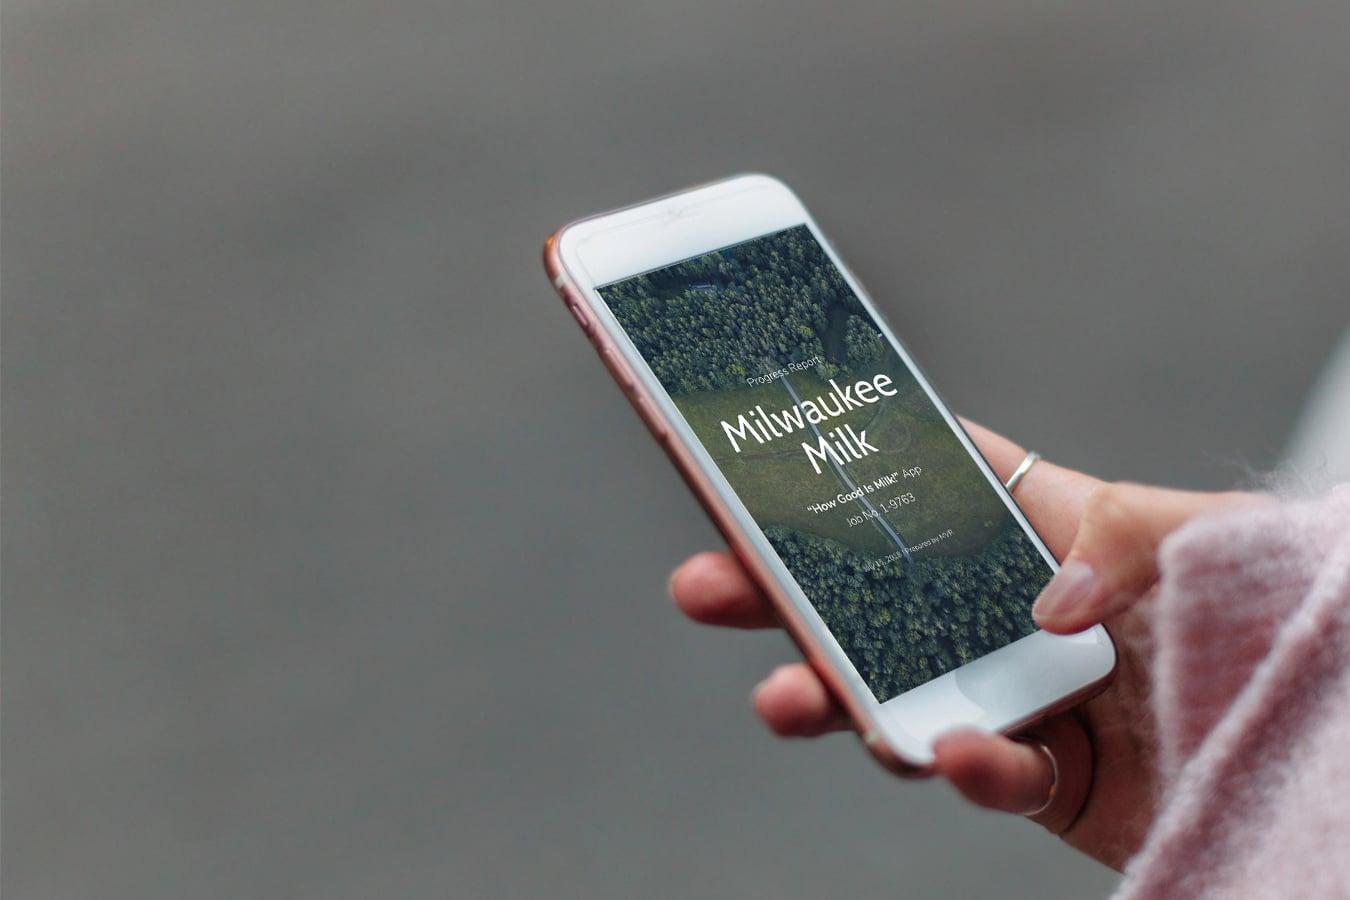 mobile-web-development-agency-progress-report-1